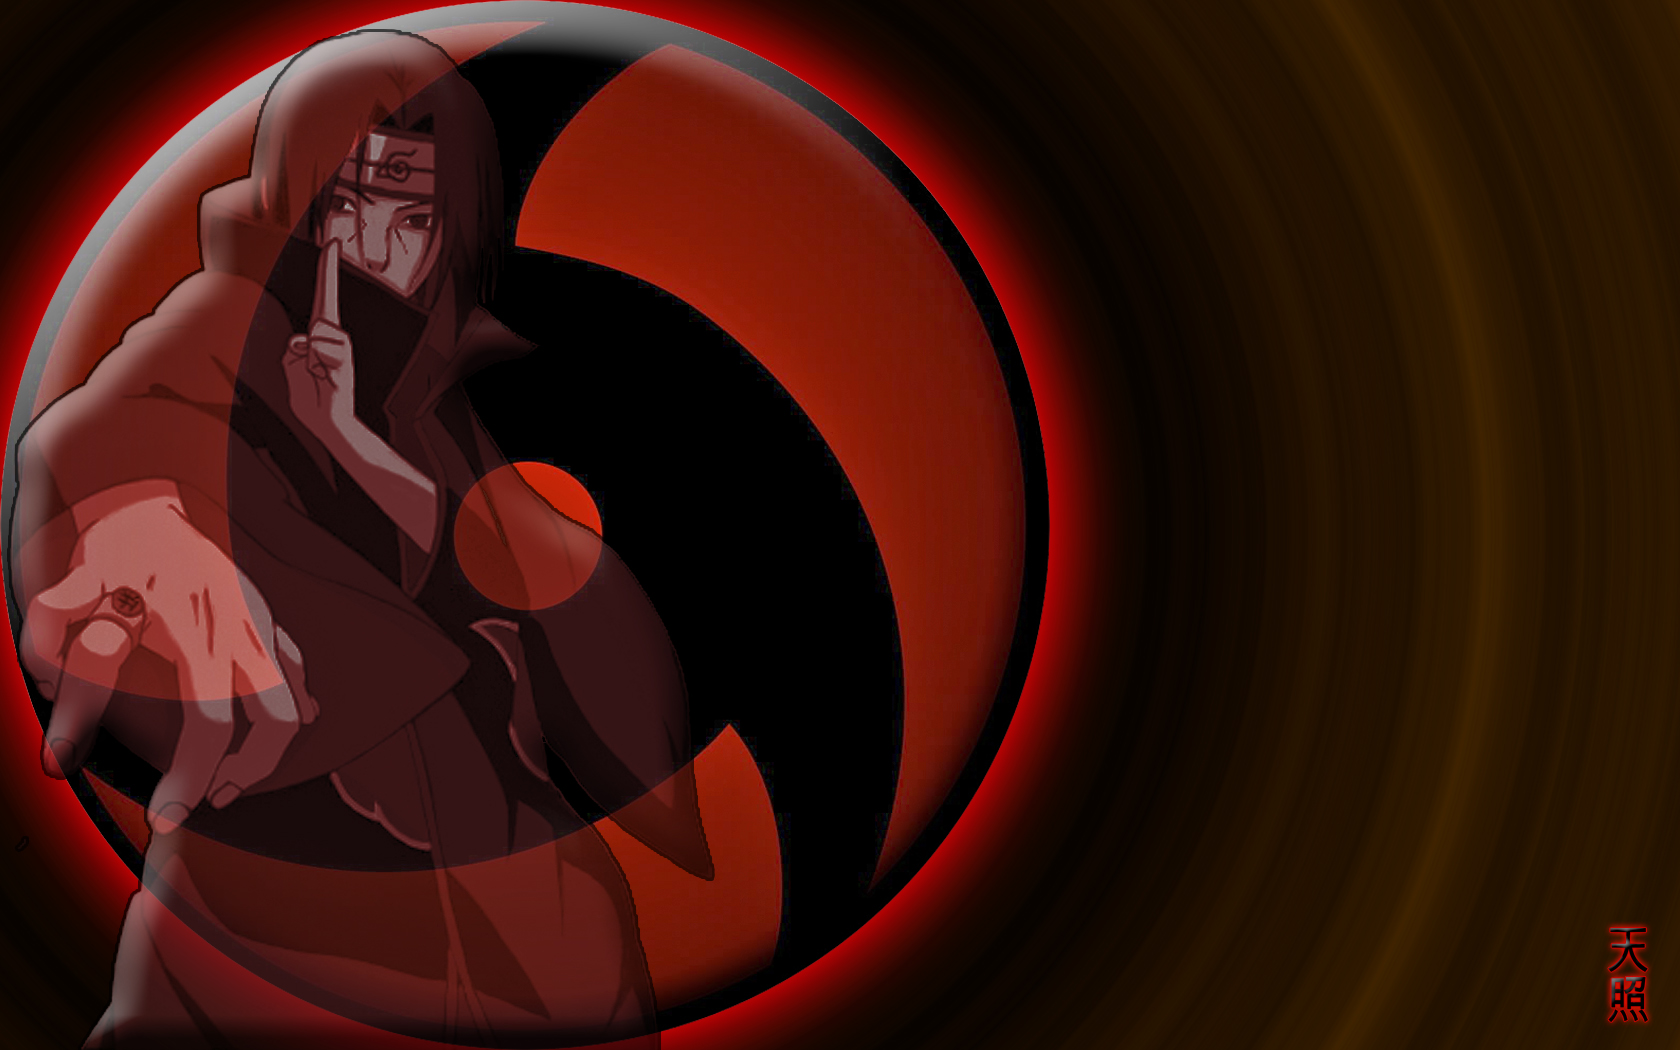 Itachi Uchiha Naruto Sharingan Anime Manga Wallpaper 3840x2400 View 0 Download Shippuden 1680x1050 Wallpoper